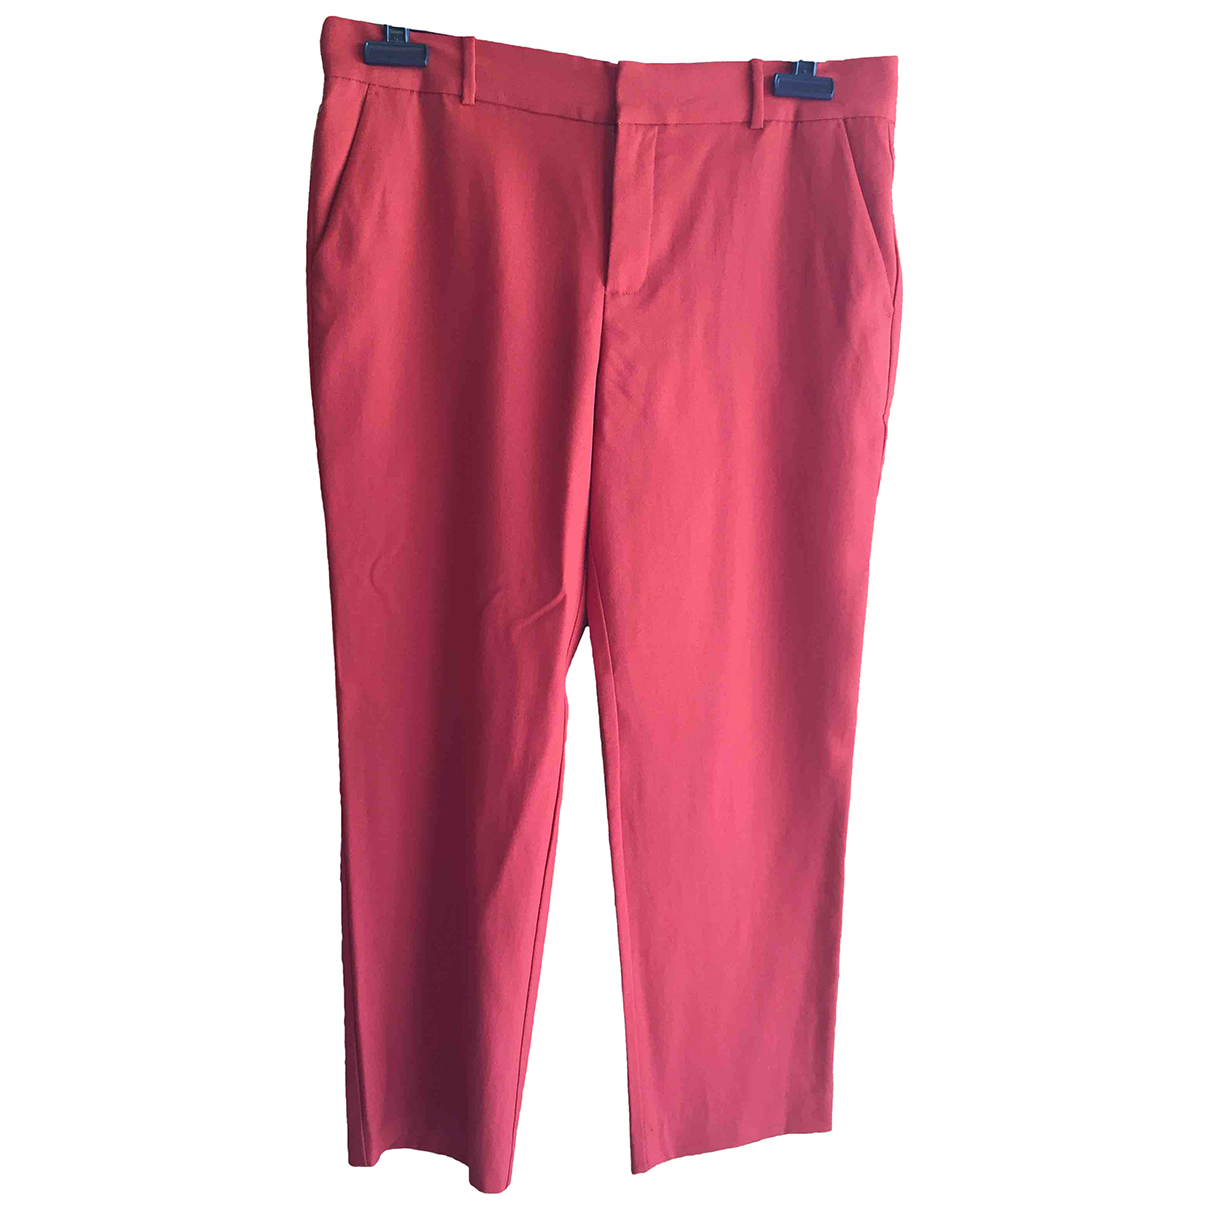 Pantalon recto de Lana Comptoir Des Cotonniers